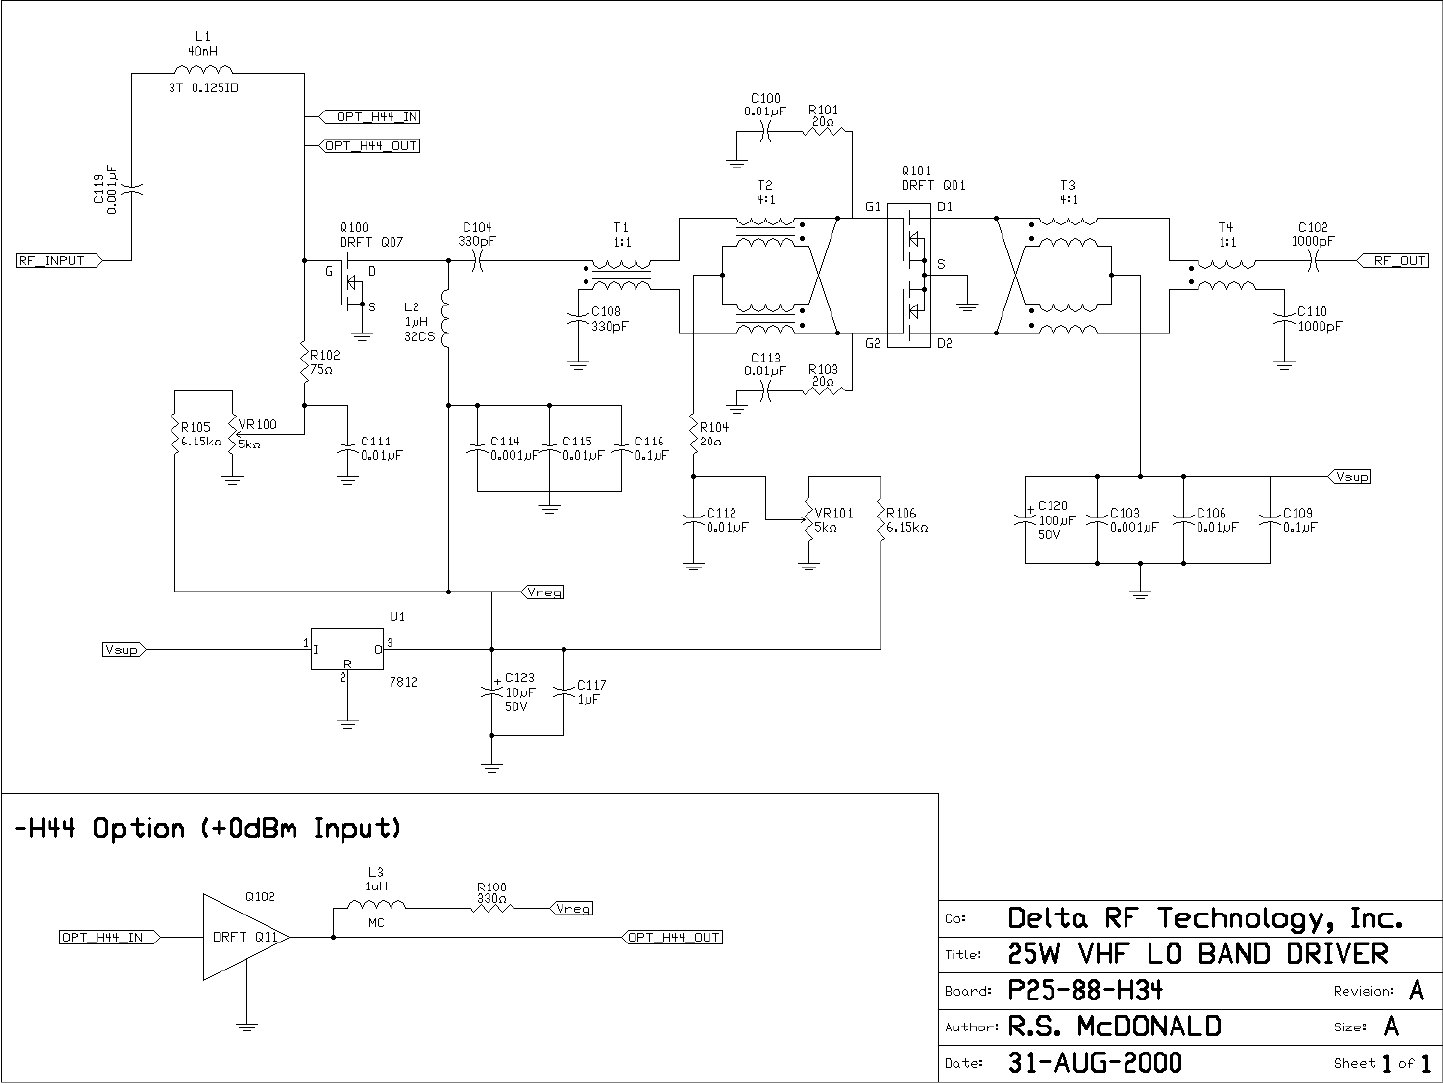 Technalogix Tav25h Vhf Television Broadcast Transmitter User Manual Ground Monitor C120 Wiring Diagram A